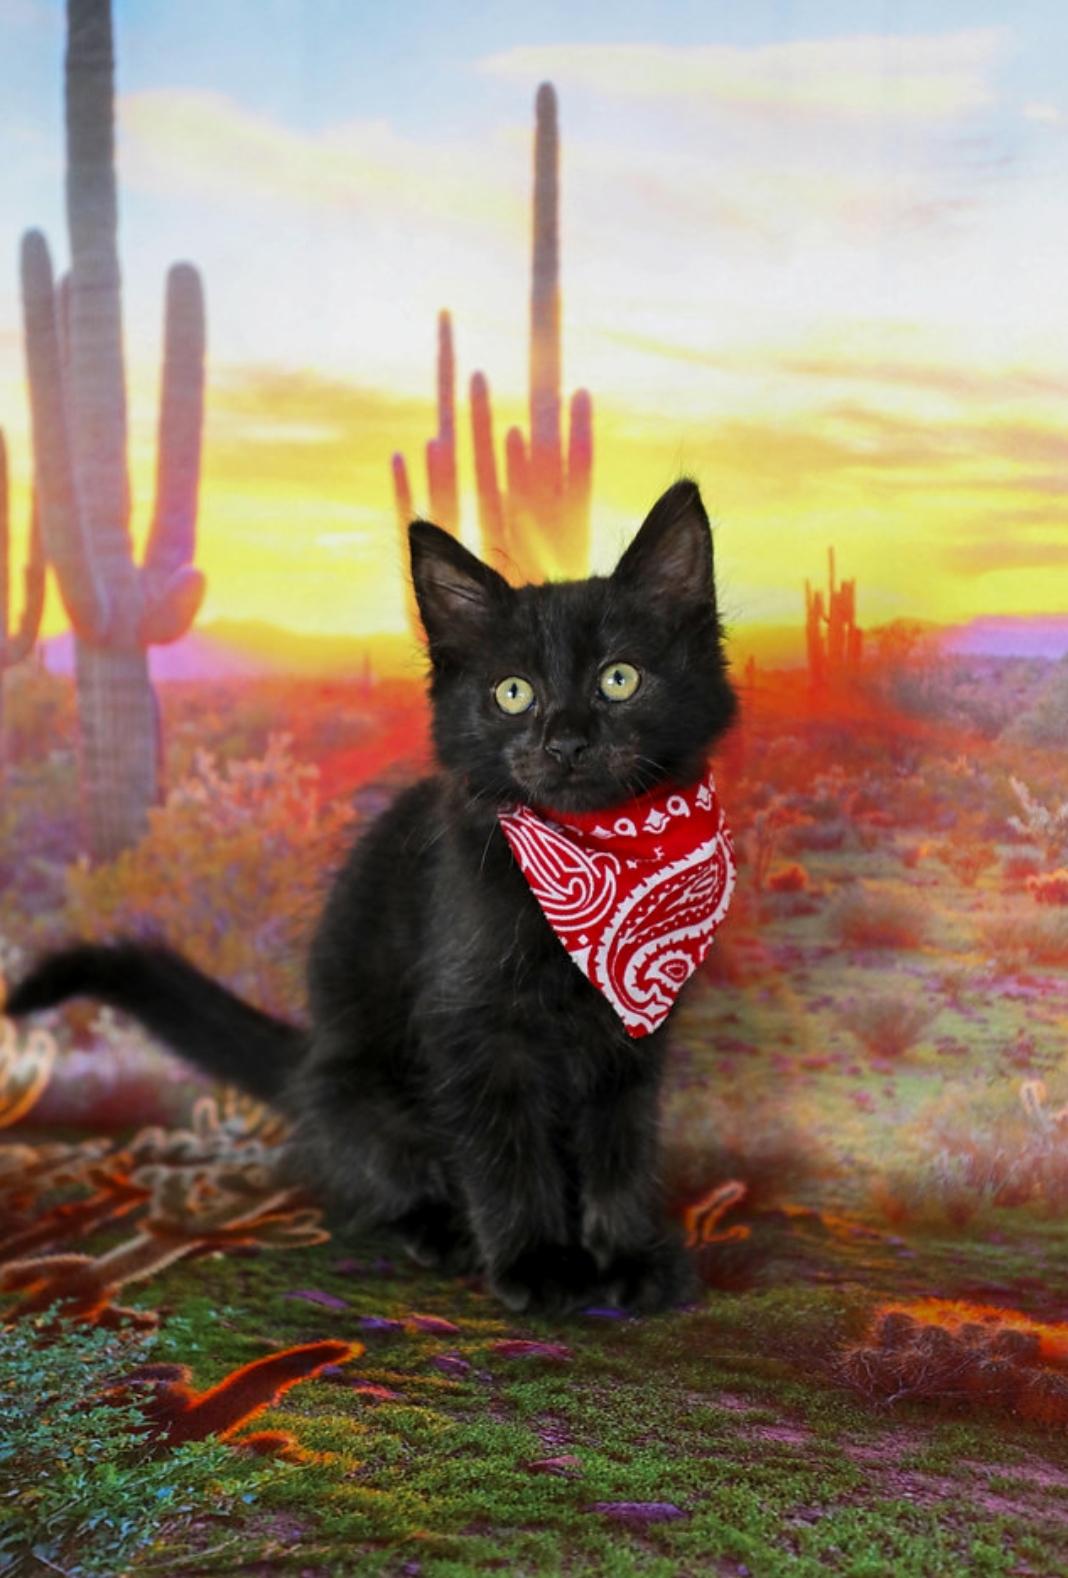 Who says black kitties arent photogenic